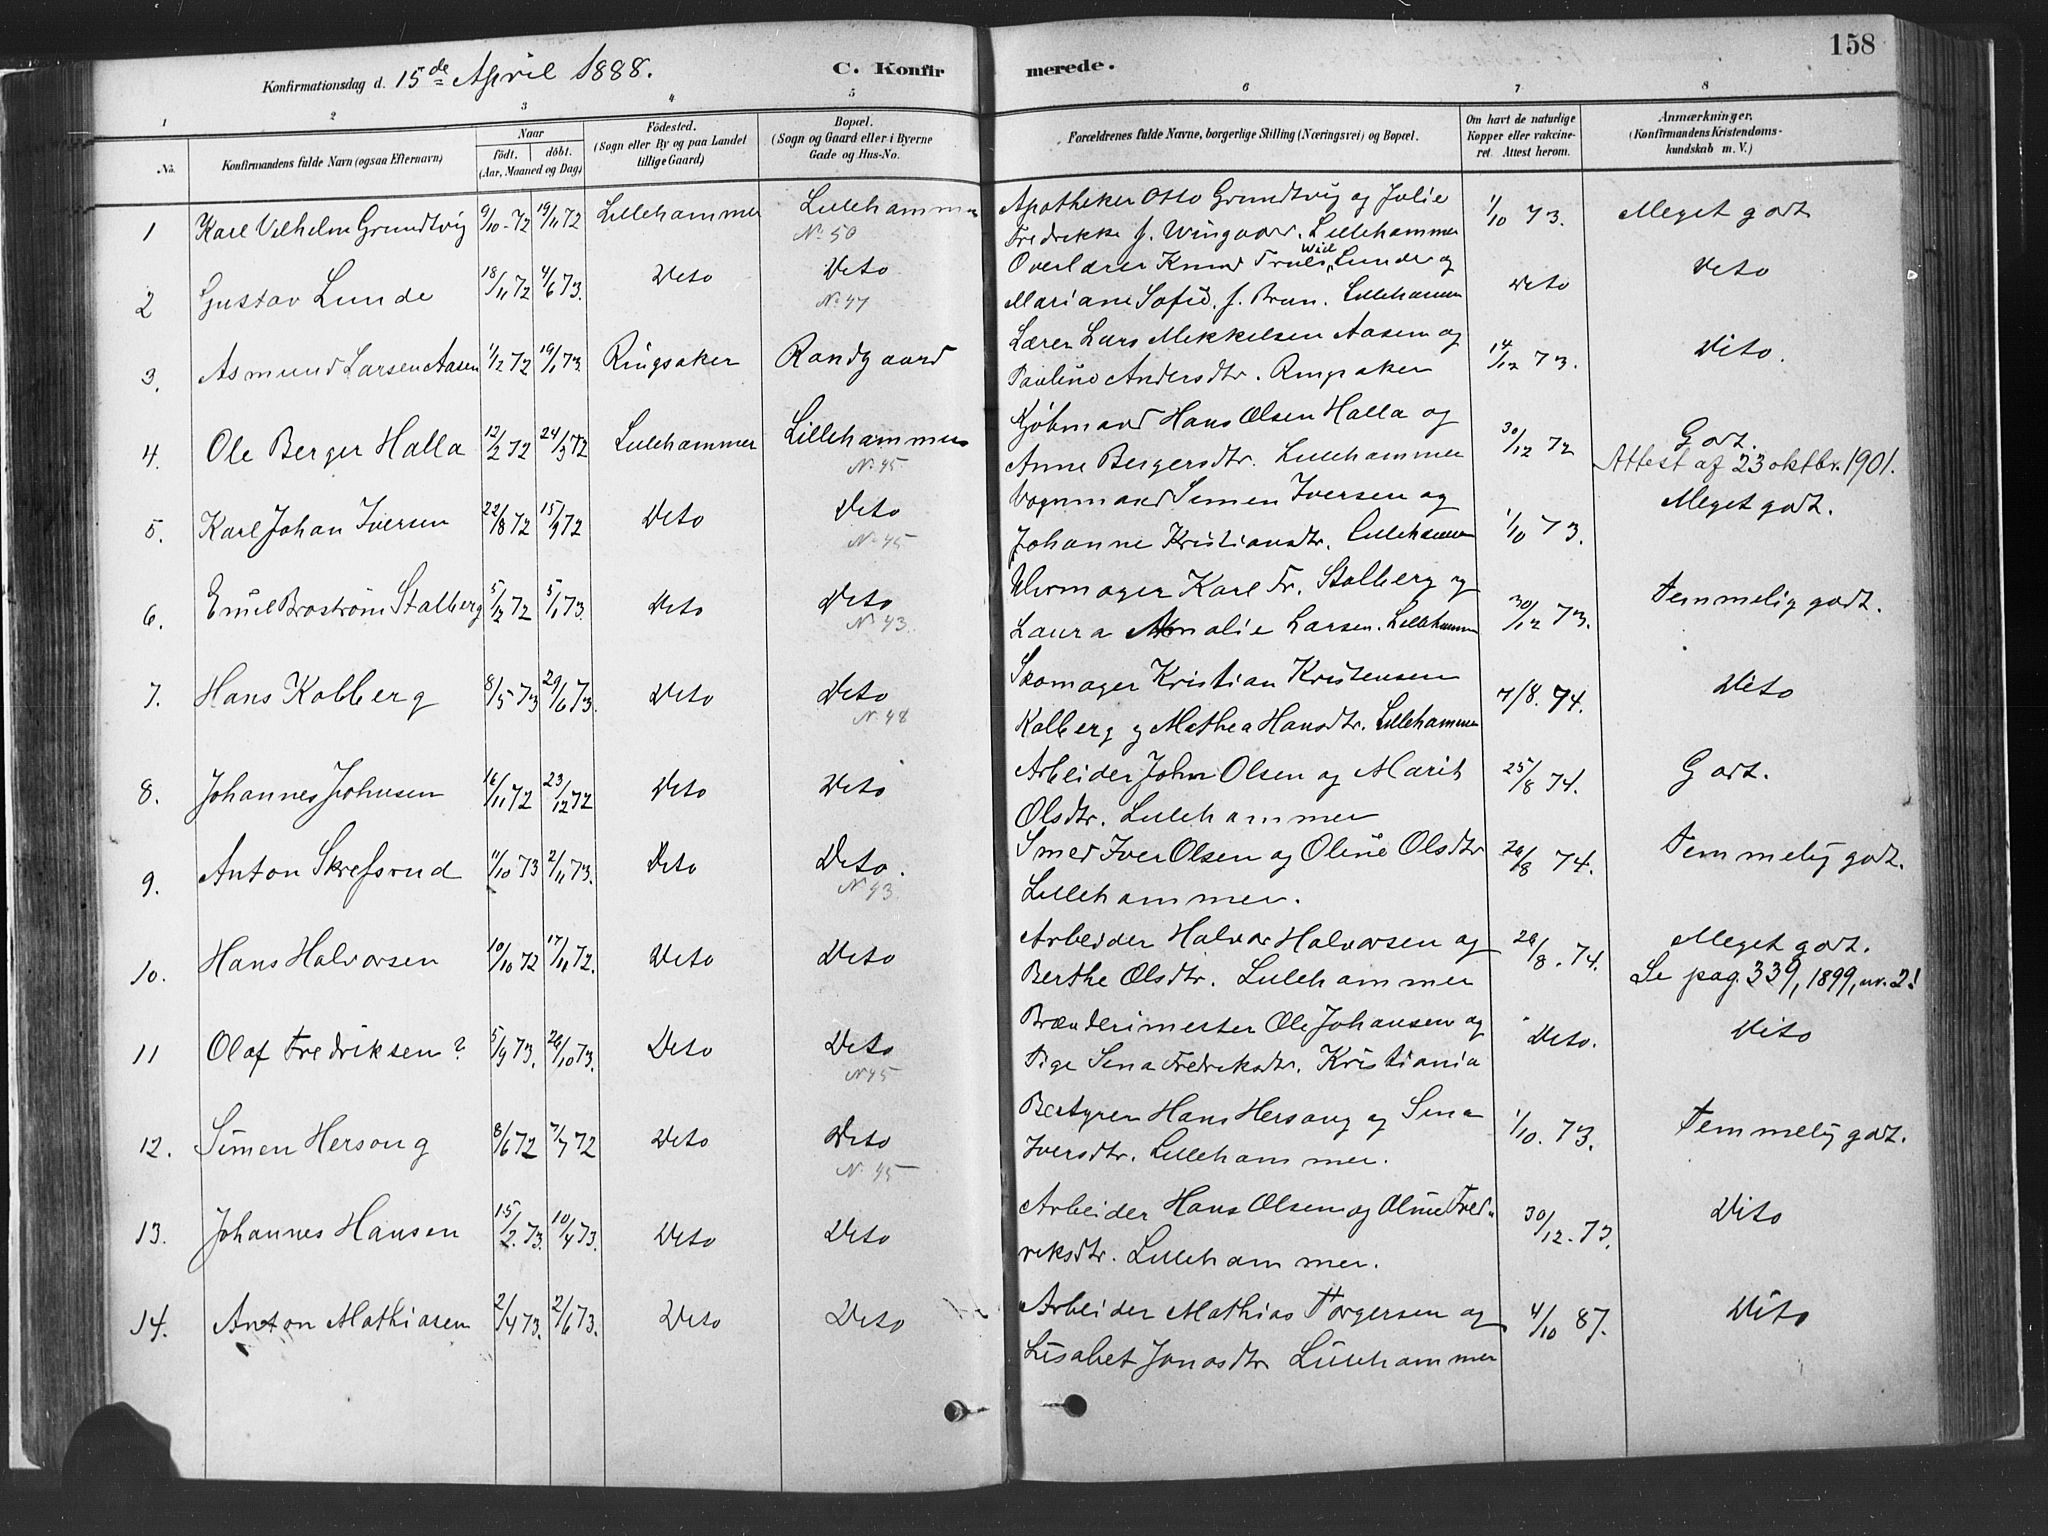 SAH, Fåberg prestekontor, H/Ha/Haa/L0010: Parish register (official) no. 10, 1879-1900, p. 158